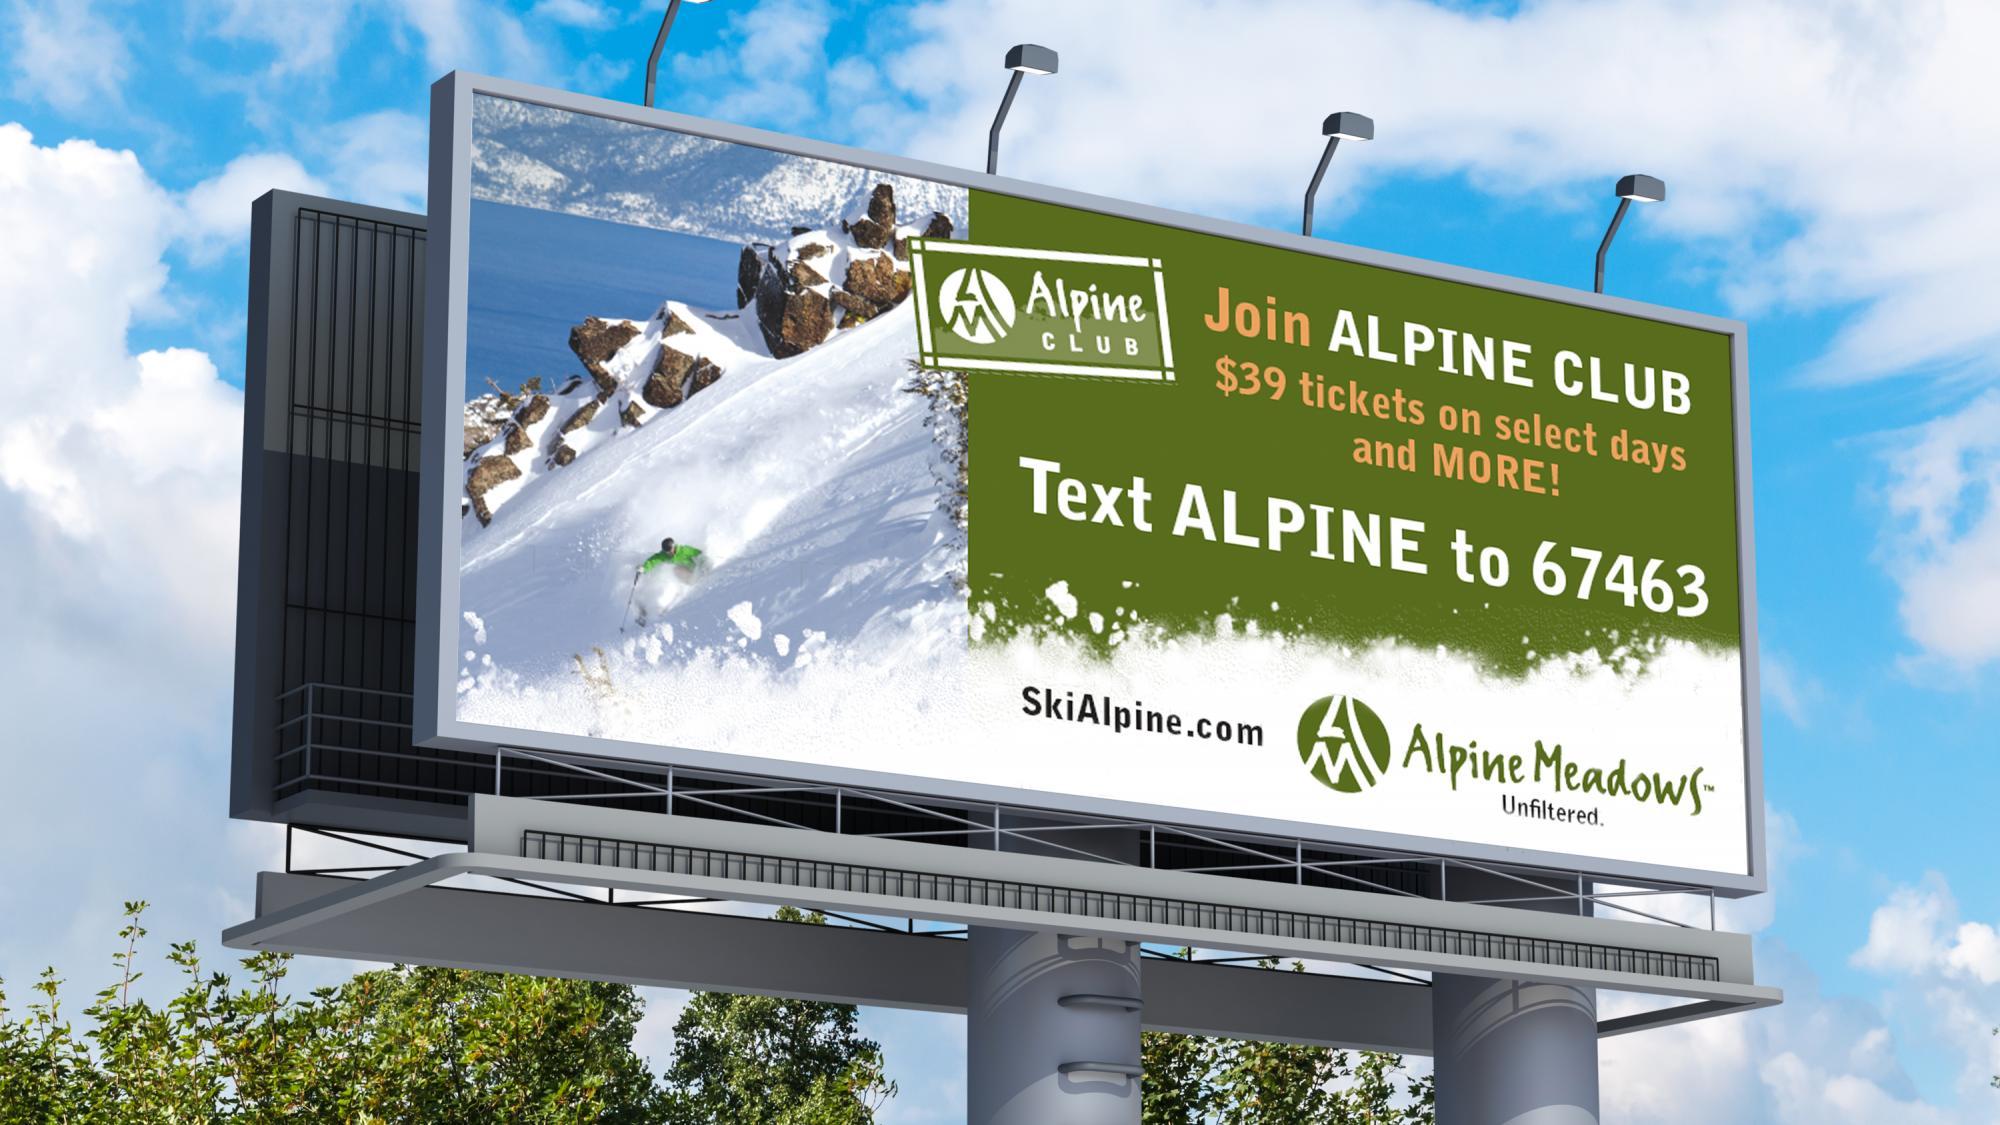 MINT_AlpineMeadows